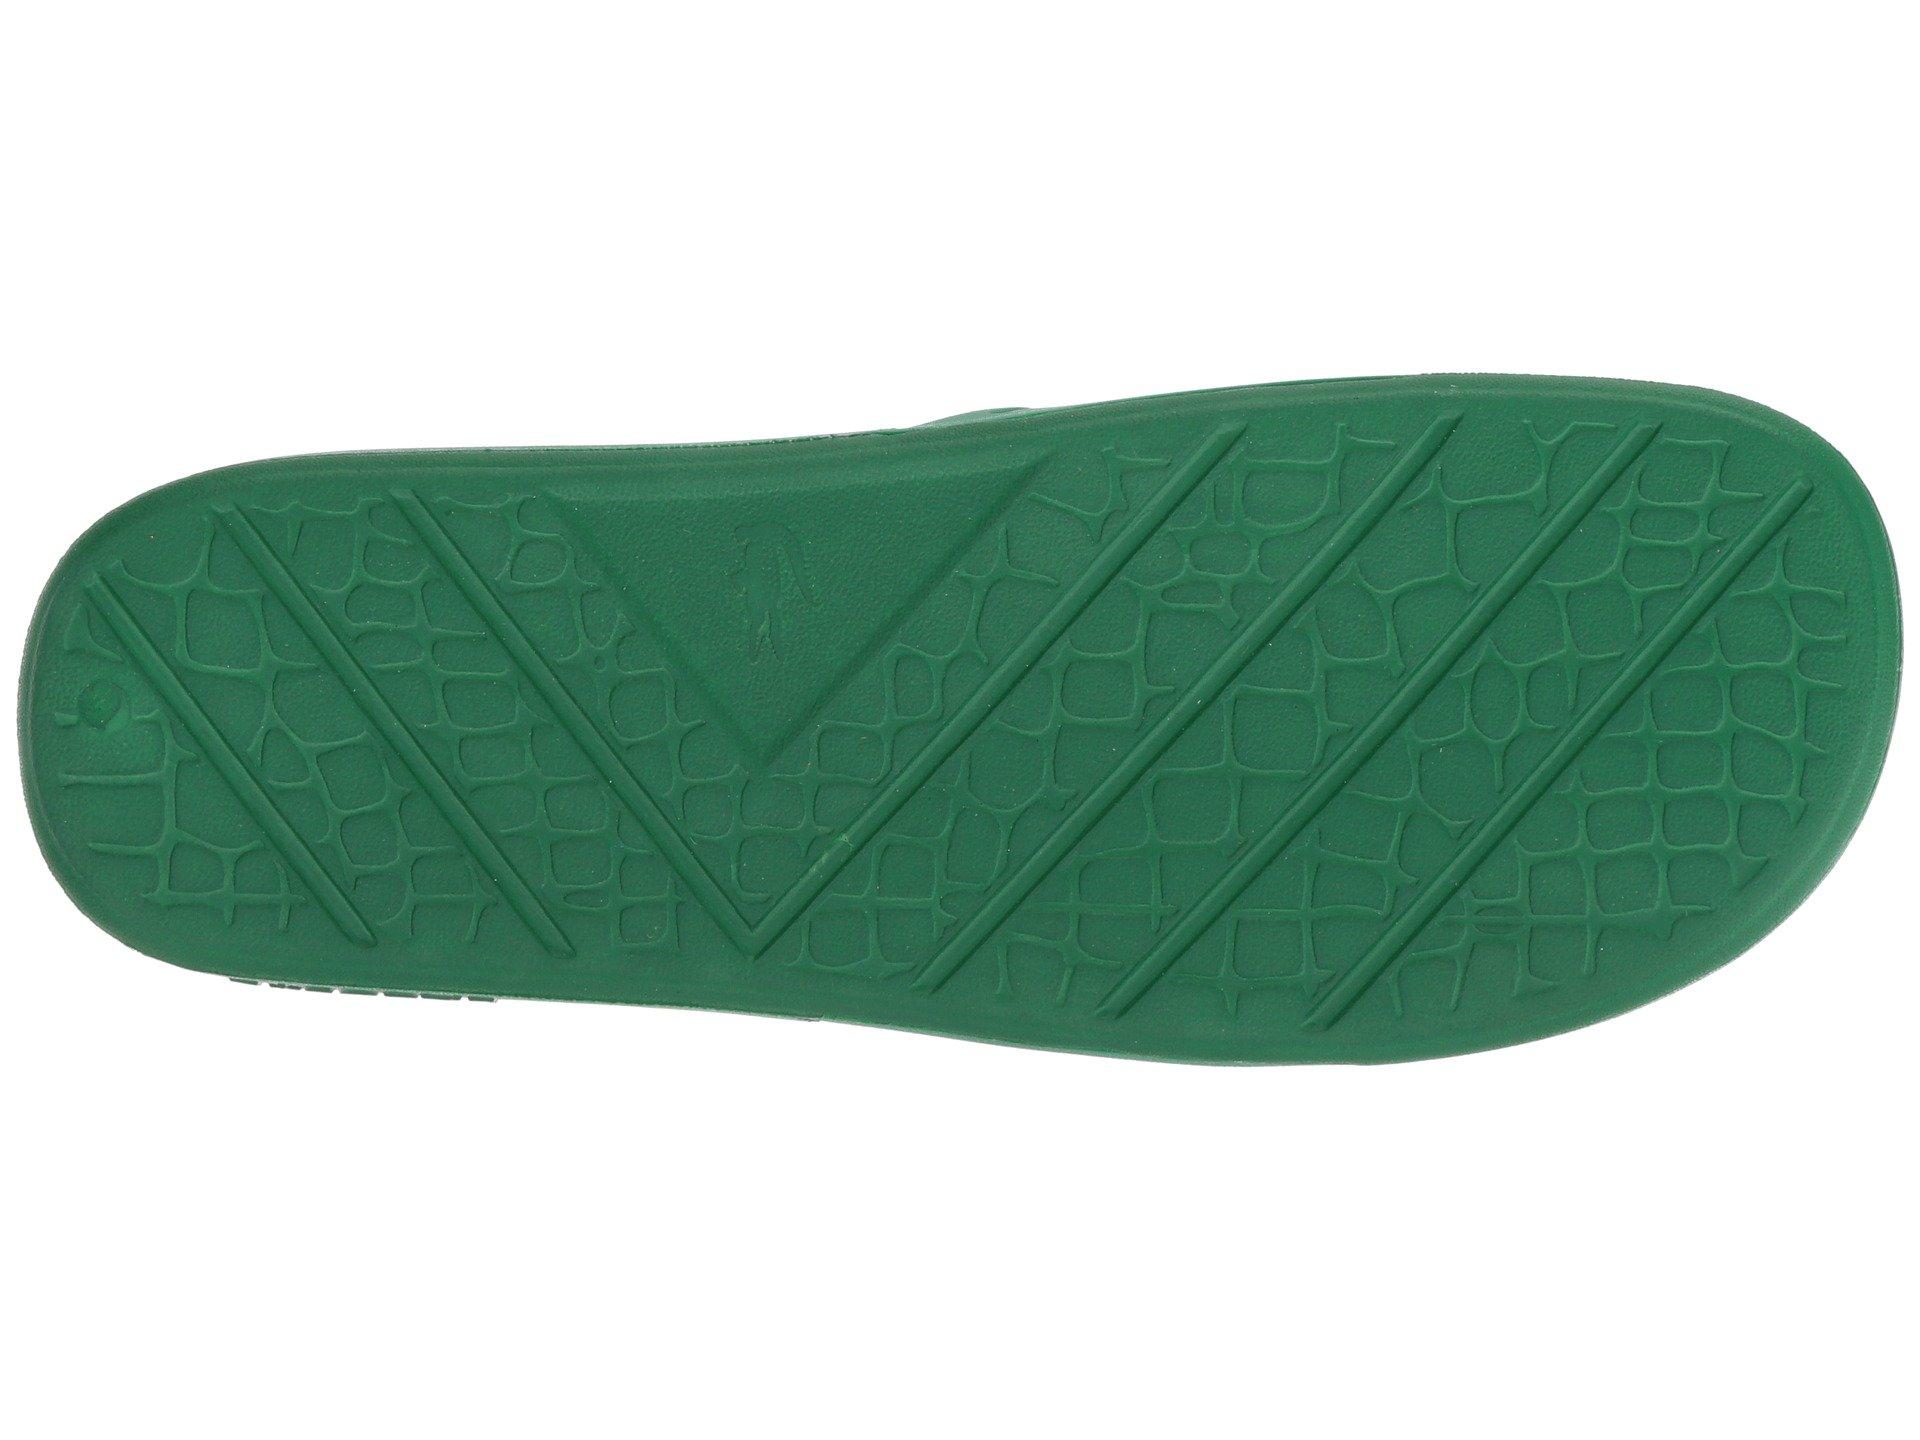 Fraisier 1 Lacoste Green P white 318 4PwHqwB